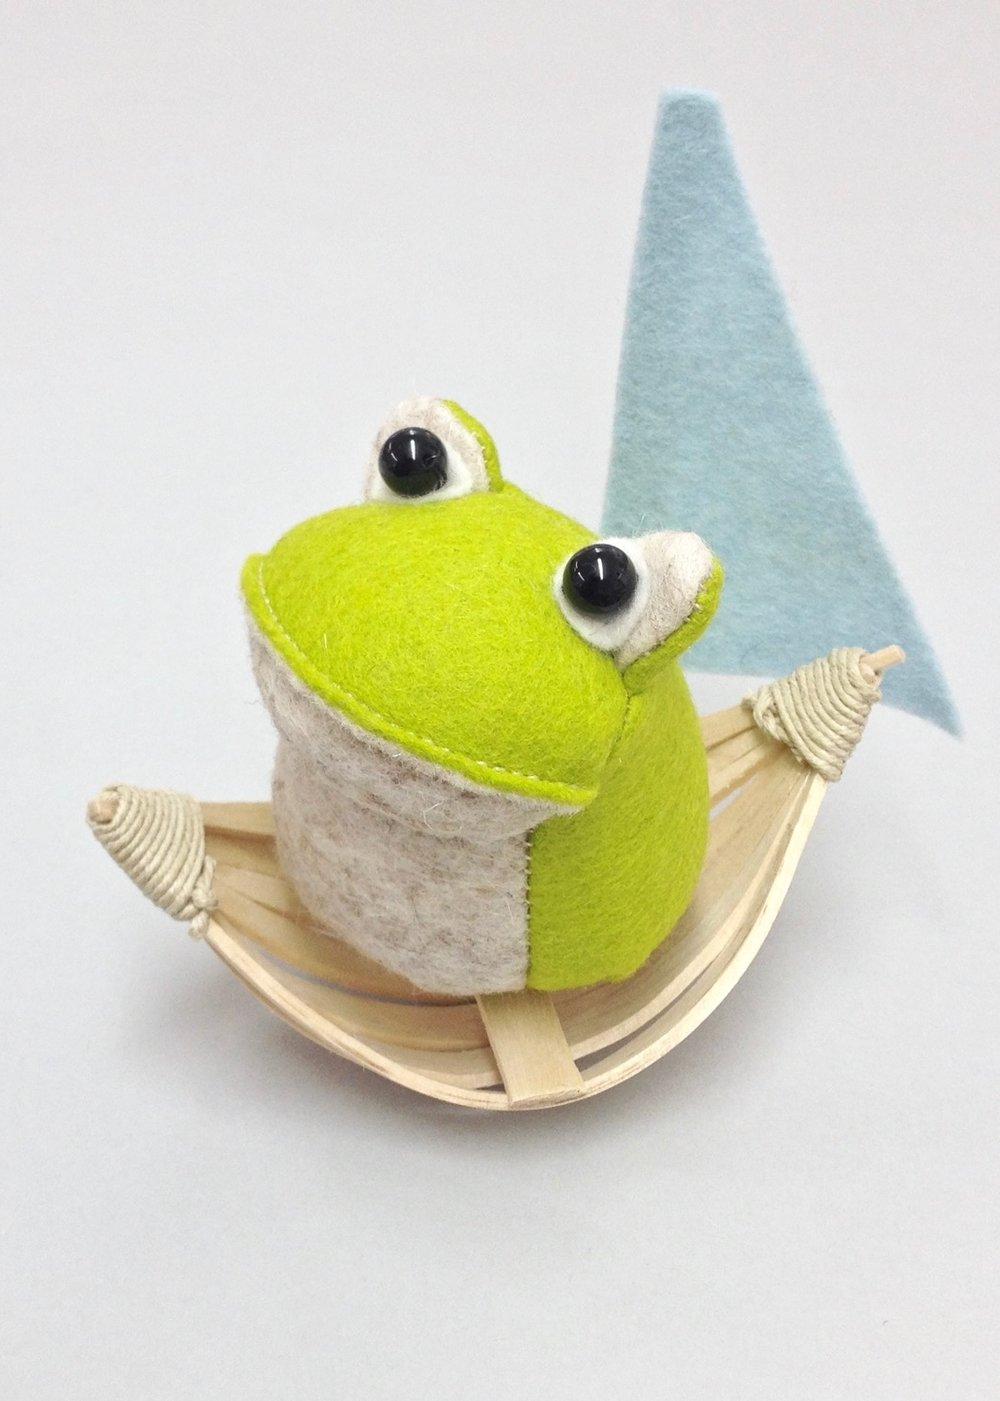 Croaker the Frog wool felt Bilberry Woods character by Laura Mirjami